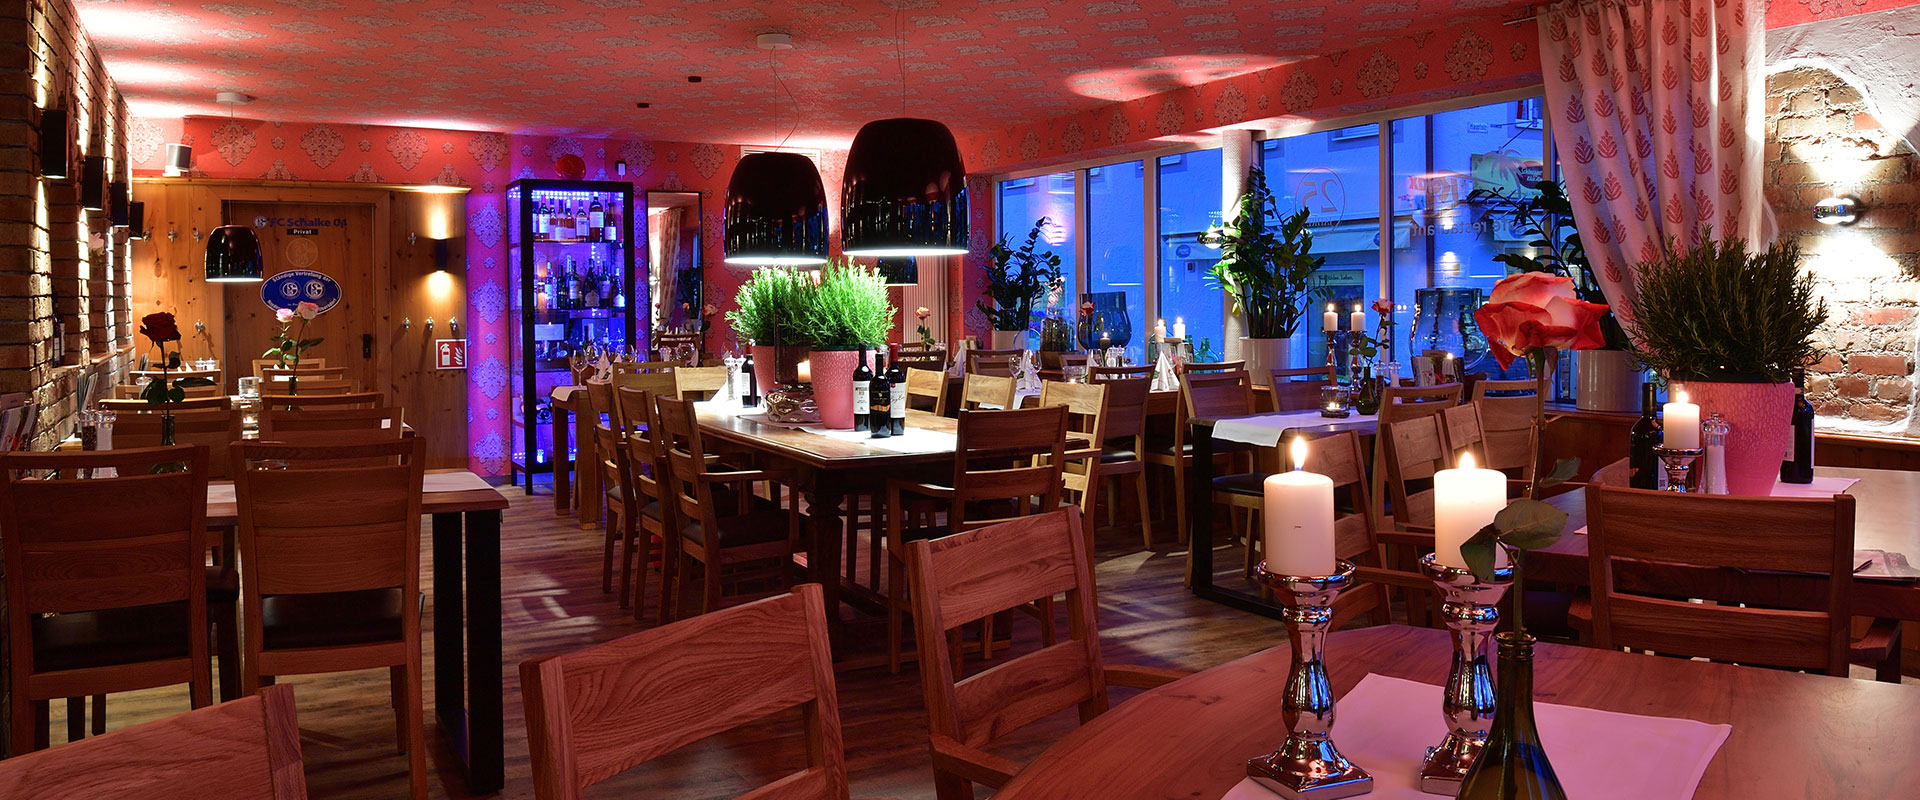 Restaurant | Cafè | Bar